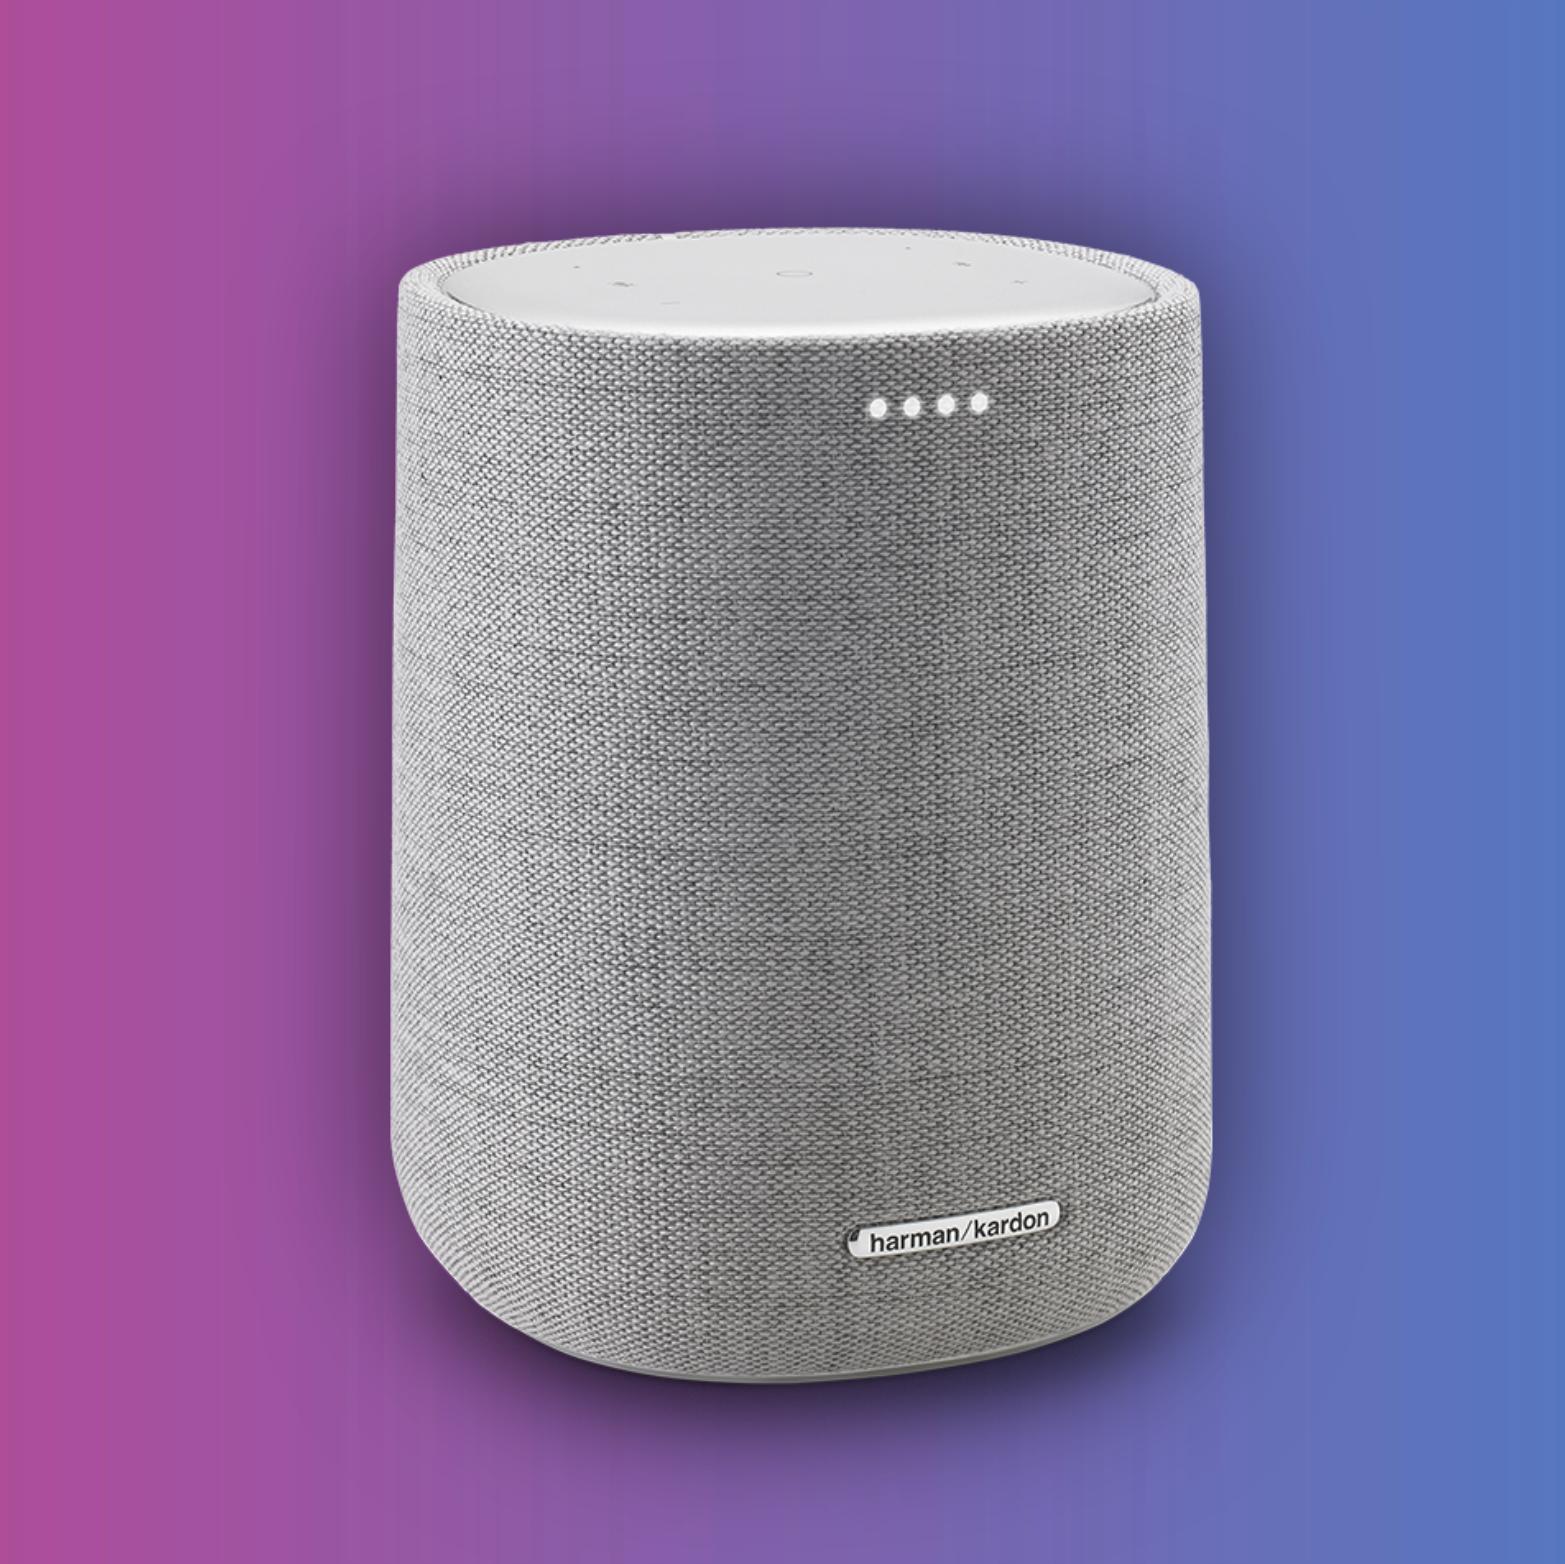 Harman/Kardon Citation One (Smart Home, WiFi, Streaming, AirPlay 2, Google Assistant)